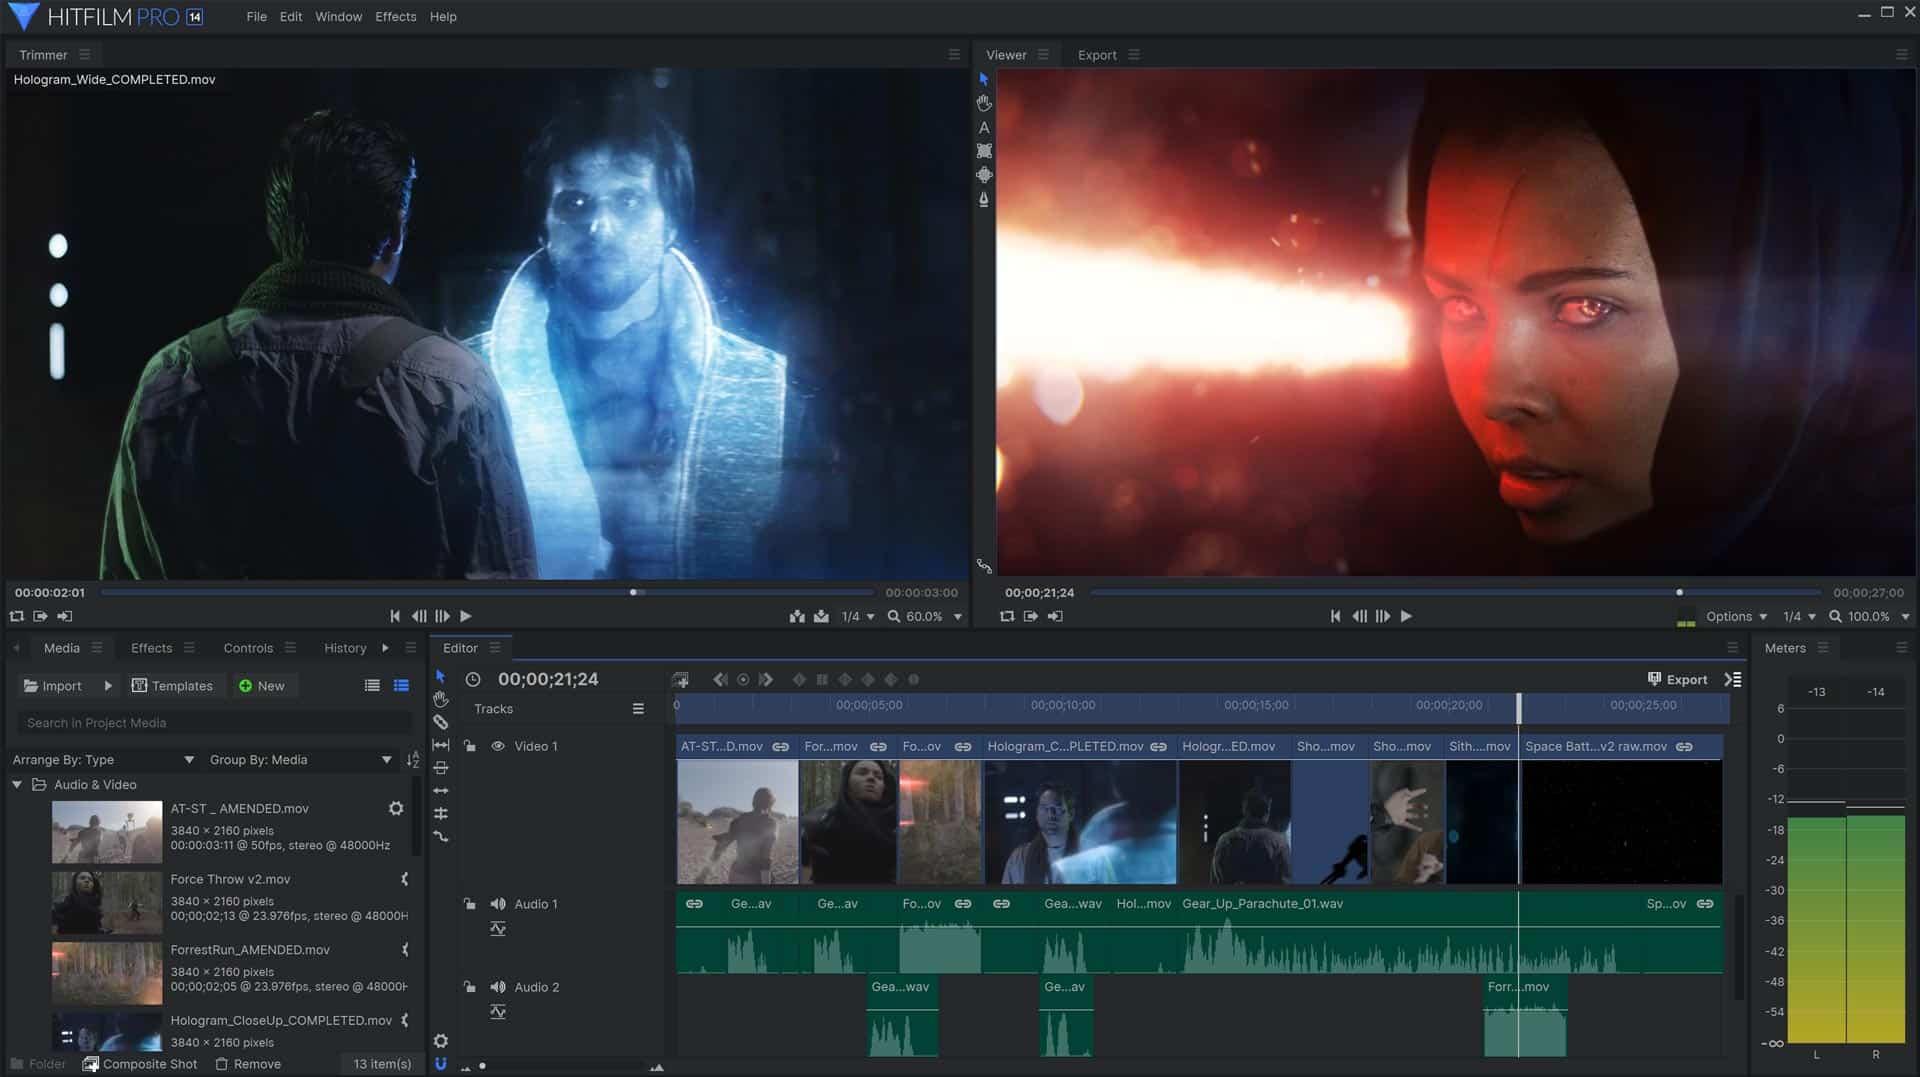 HitFilm-Pro